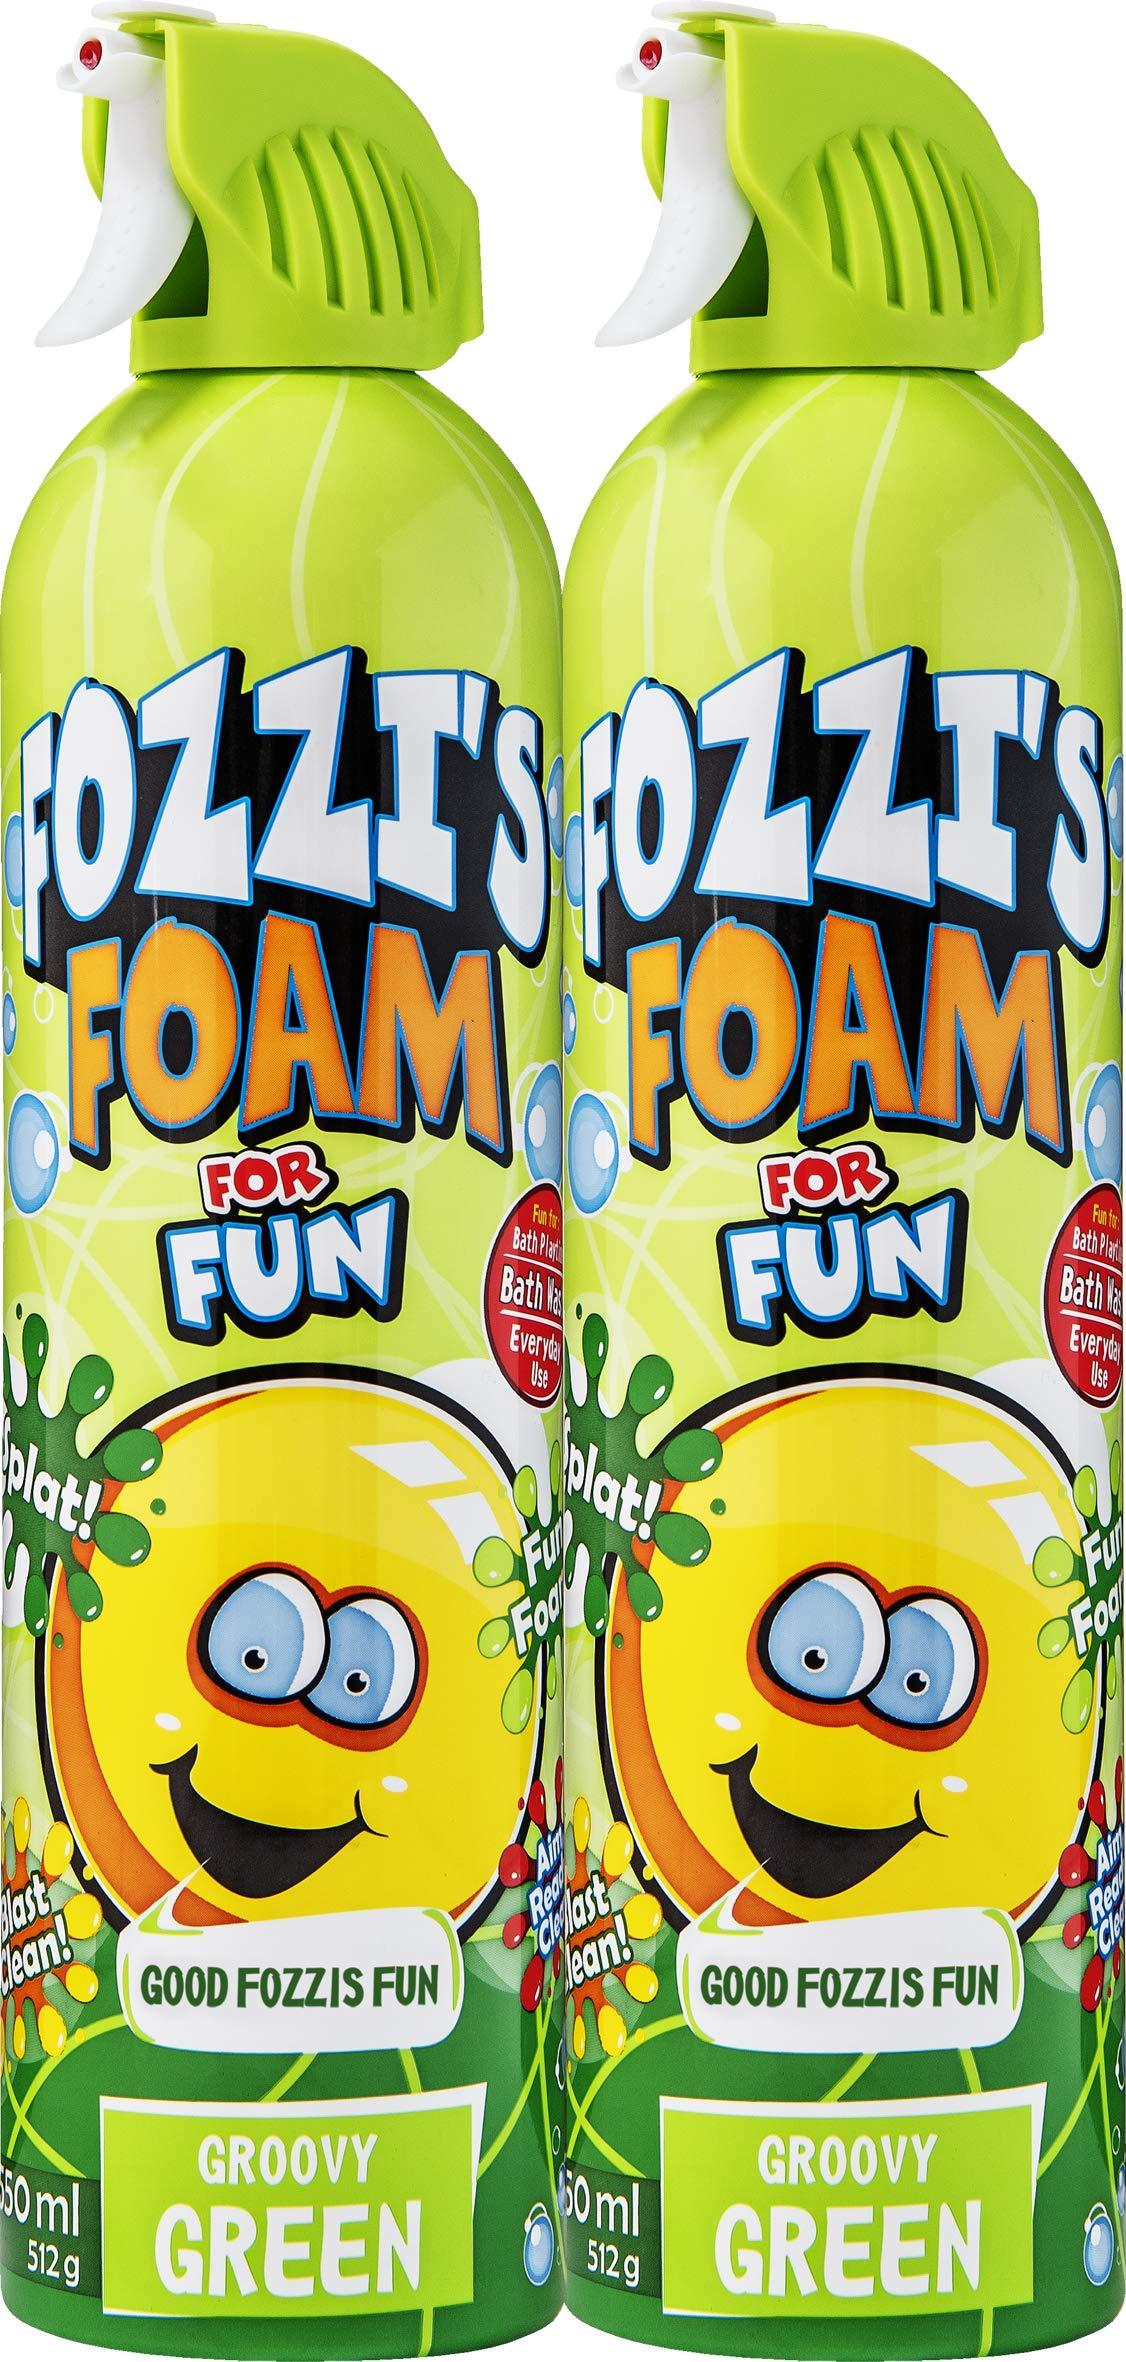 FOZZI's Bath Foam Aerosol for Kids, Groovy Green, Good Clean Fun, 600ml Each (Pack of 2) by FOZZI's